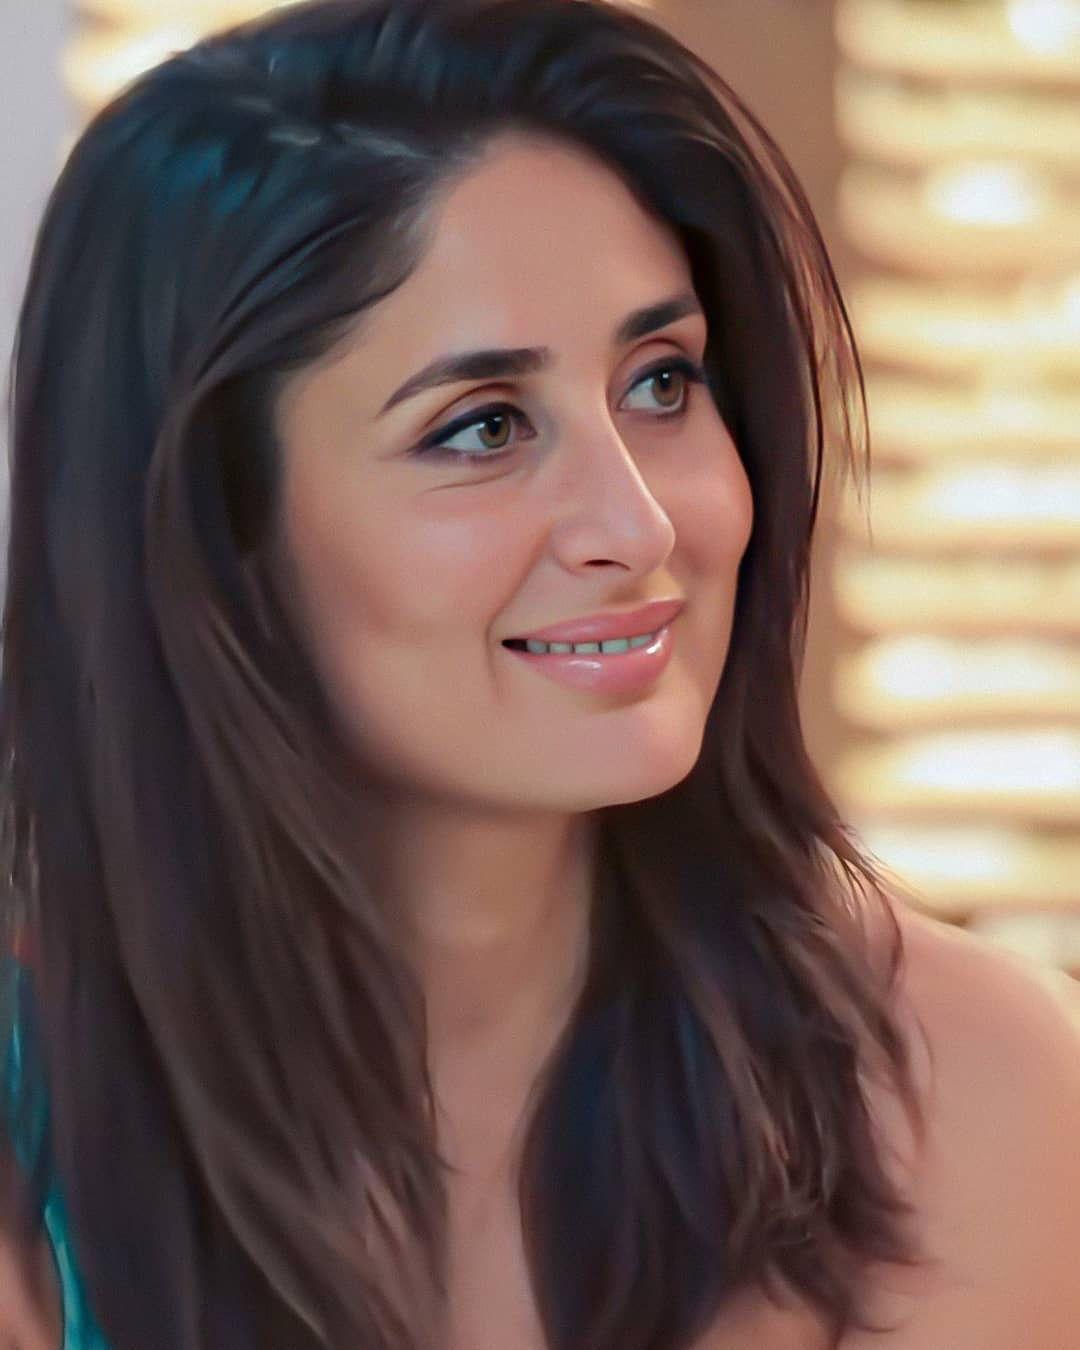 Kareena Kapoor Khan Biography Age Height Movies Net Worth More Buzzzfly Kareena Kapoor Khan Kareena Kapoor Karena Kapoor